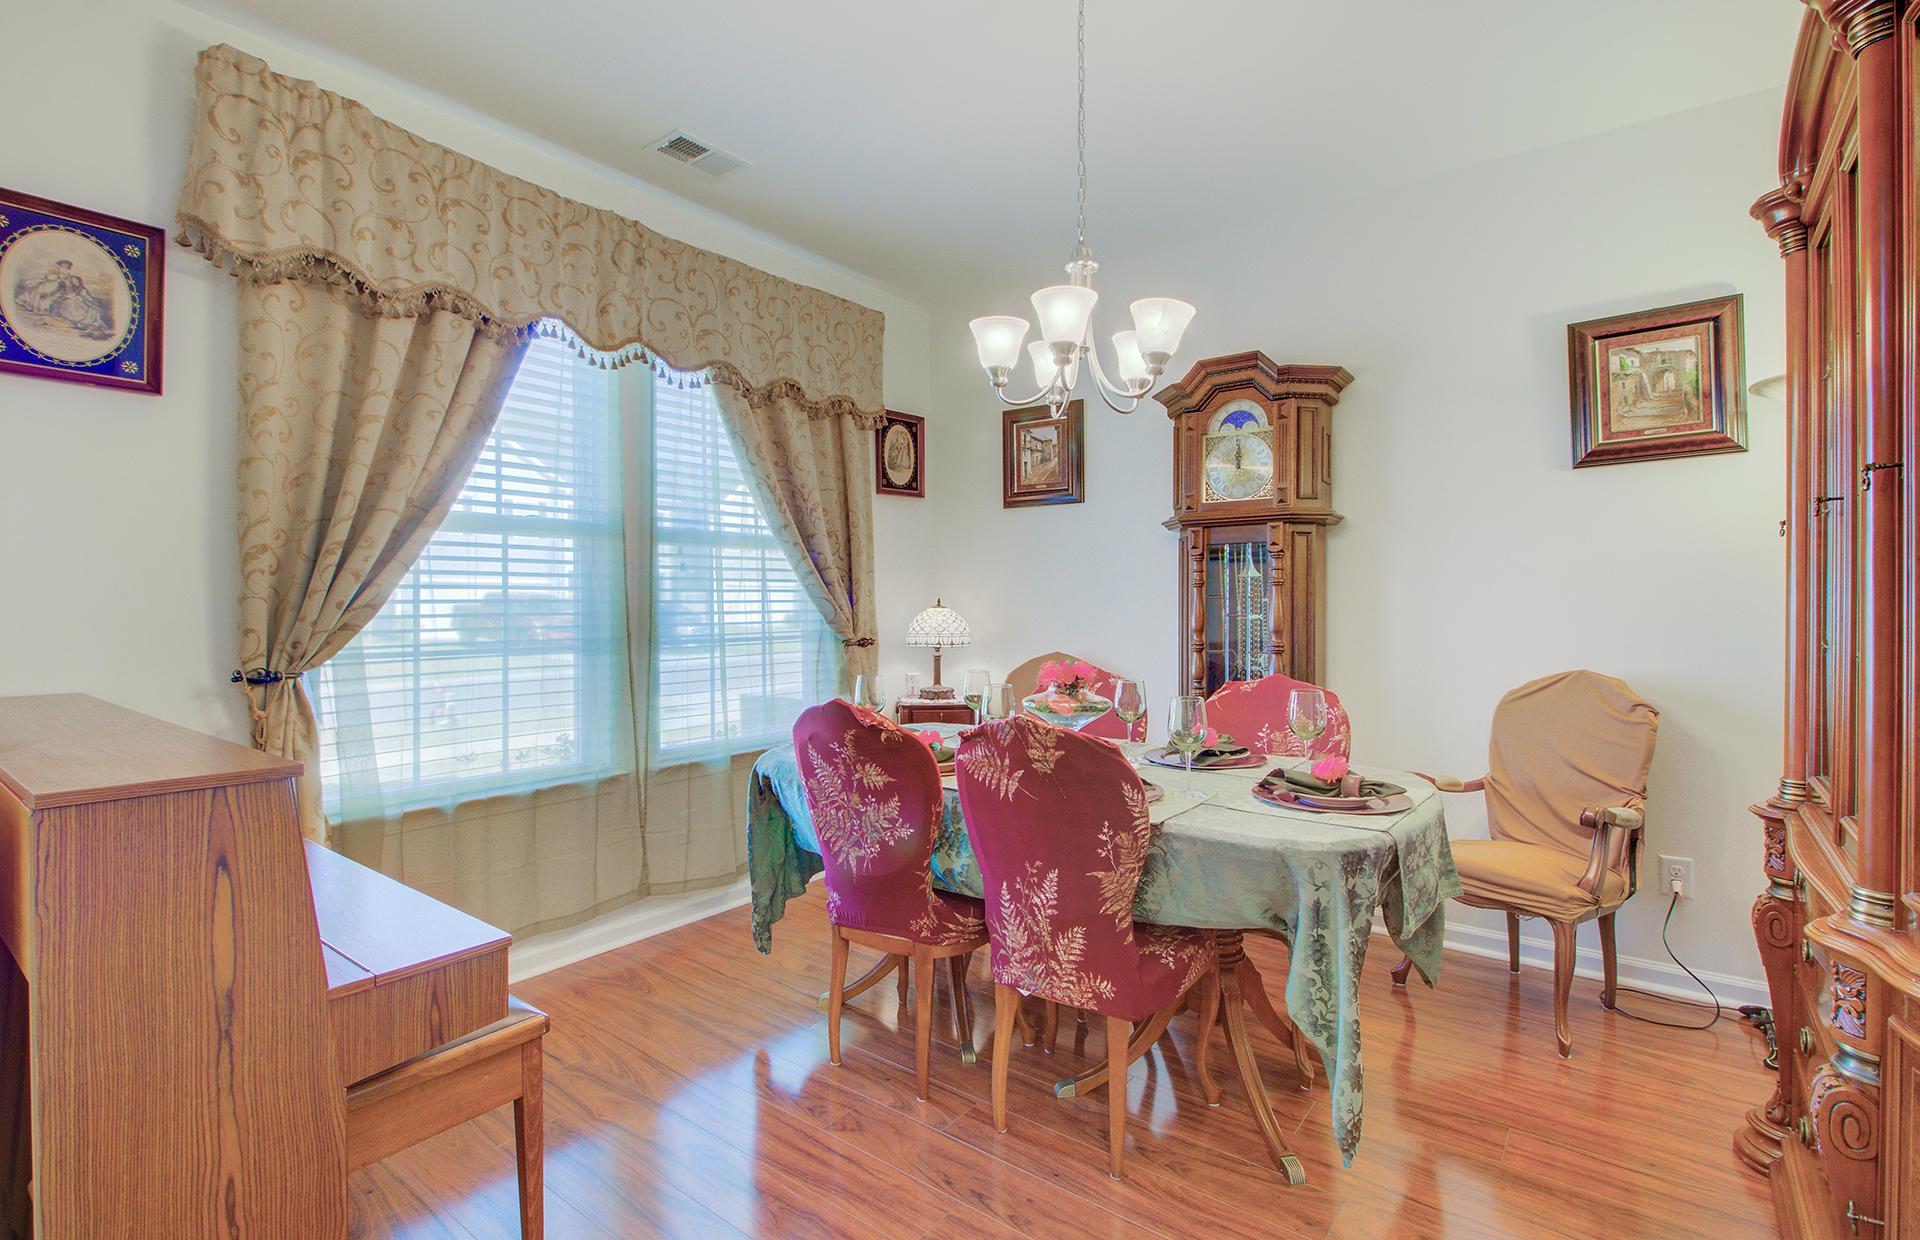 Cane Bay Plantation Homes For Sale - 255 Spectrum, Summerville, SC - 5